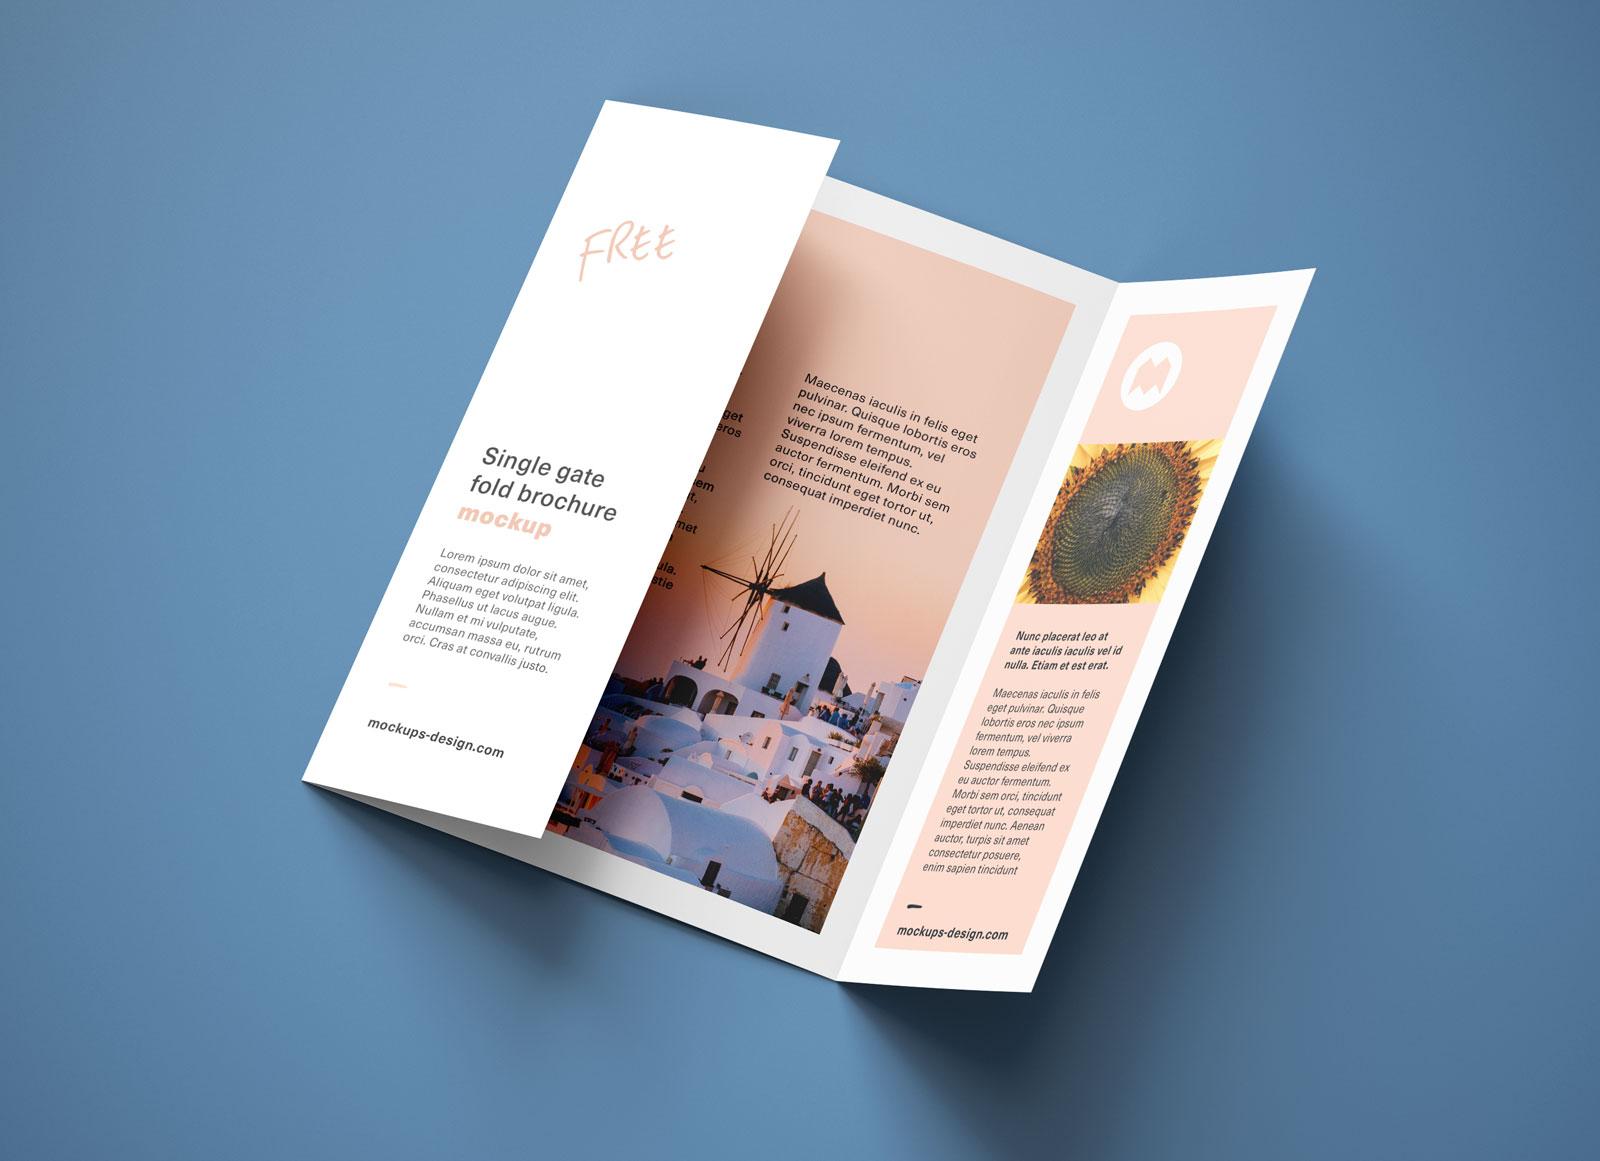 Free-Single-Gate-Fold-Brochure-Mockup-PSD-Set-2